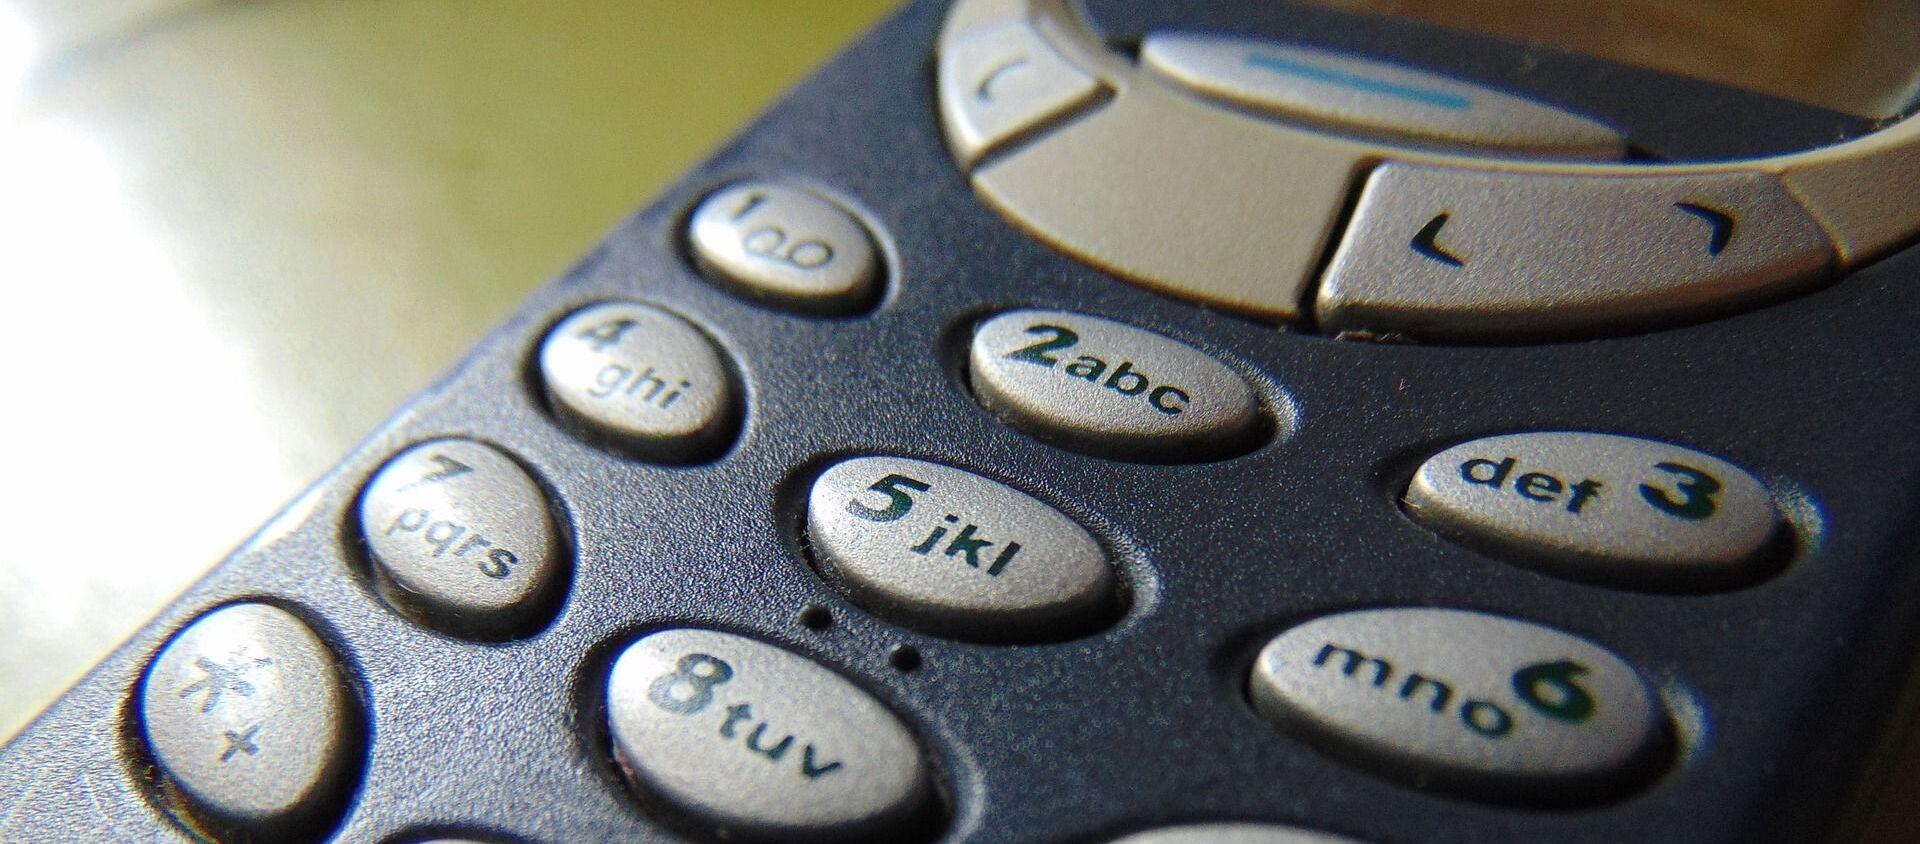 Nokia 3310 - Sputnik Polska, 1920, 12.02.2021